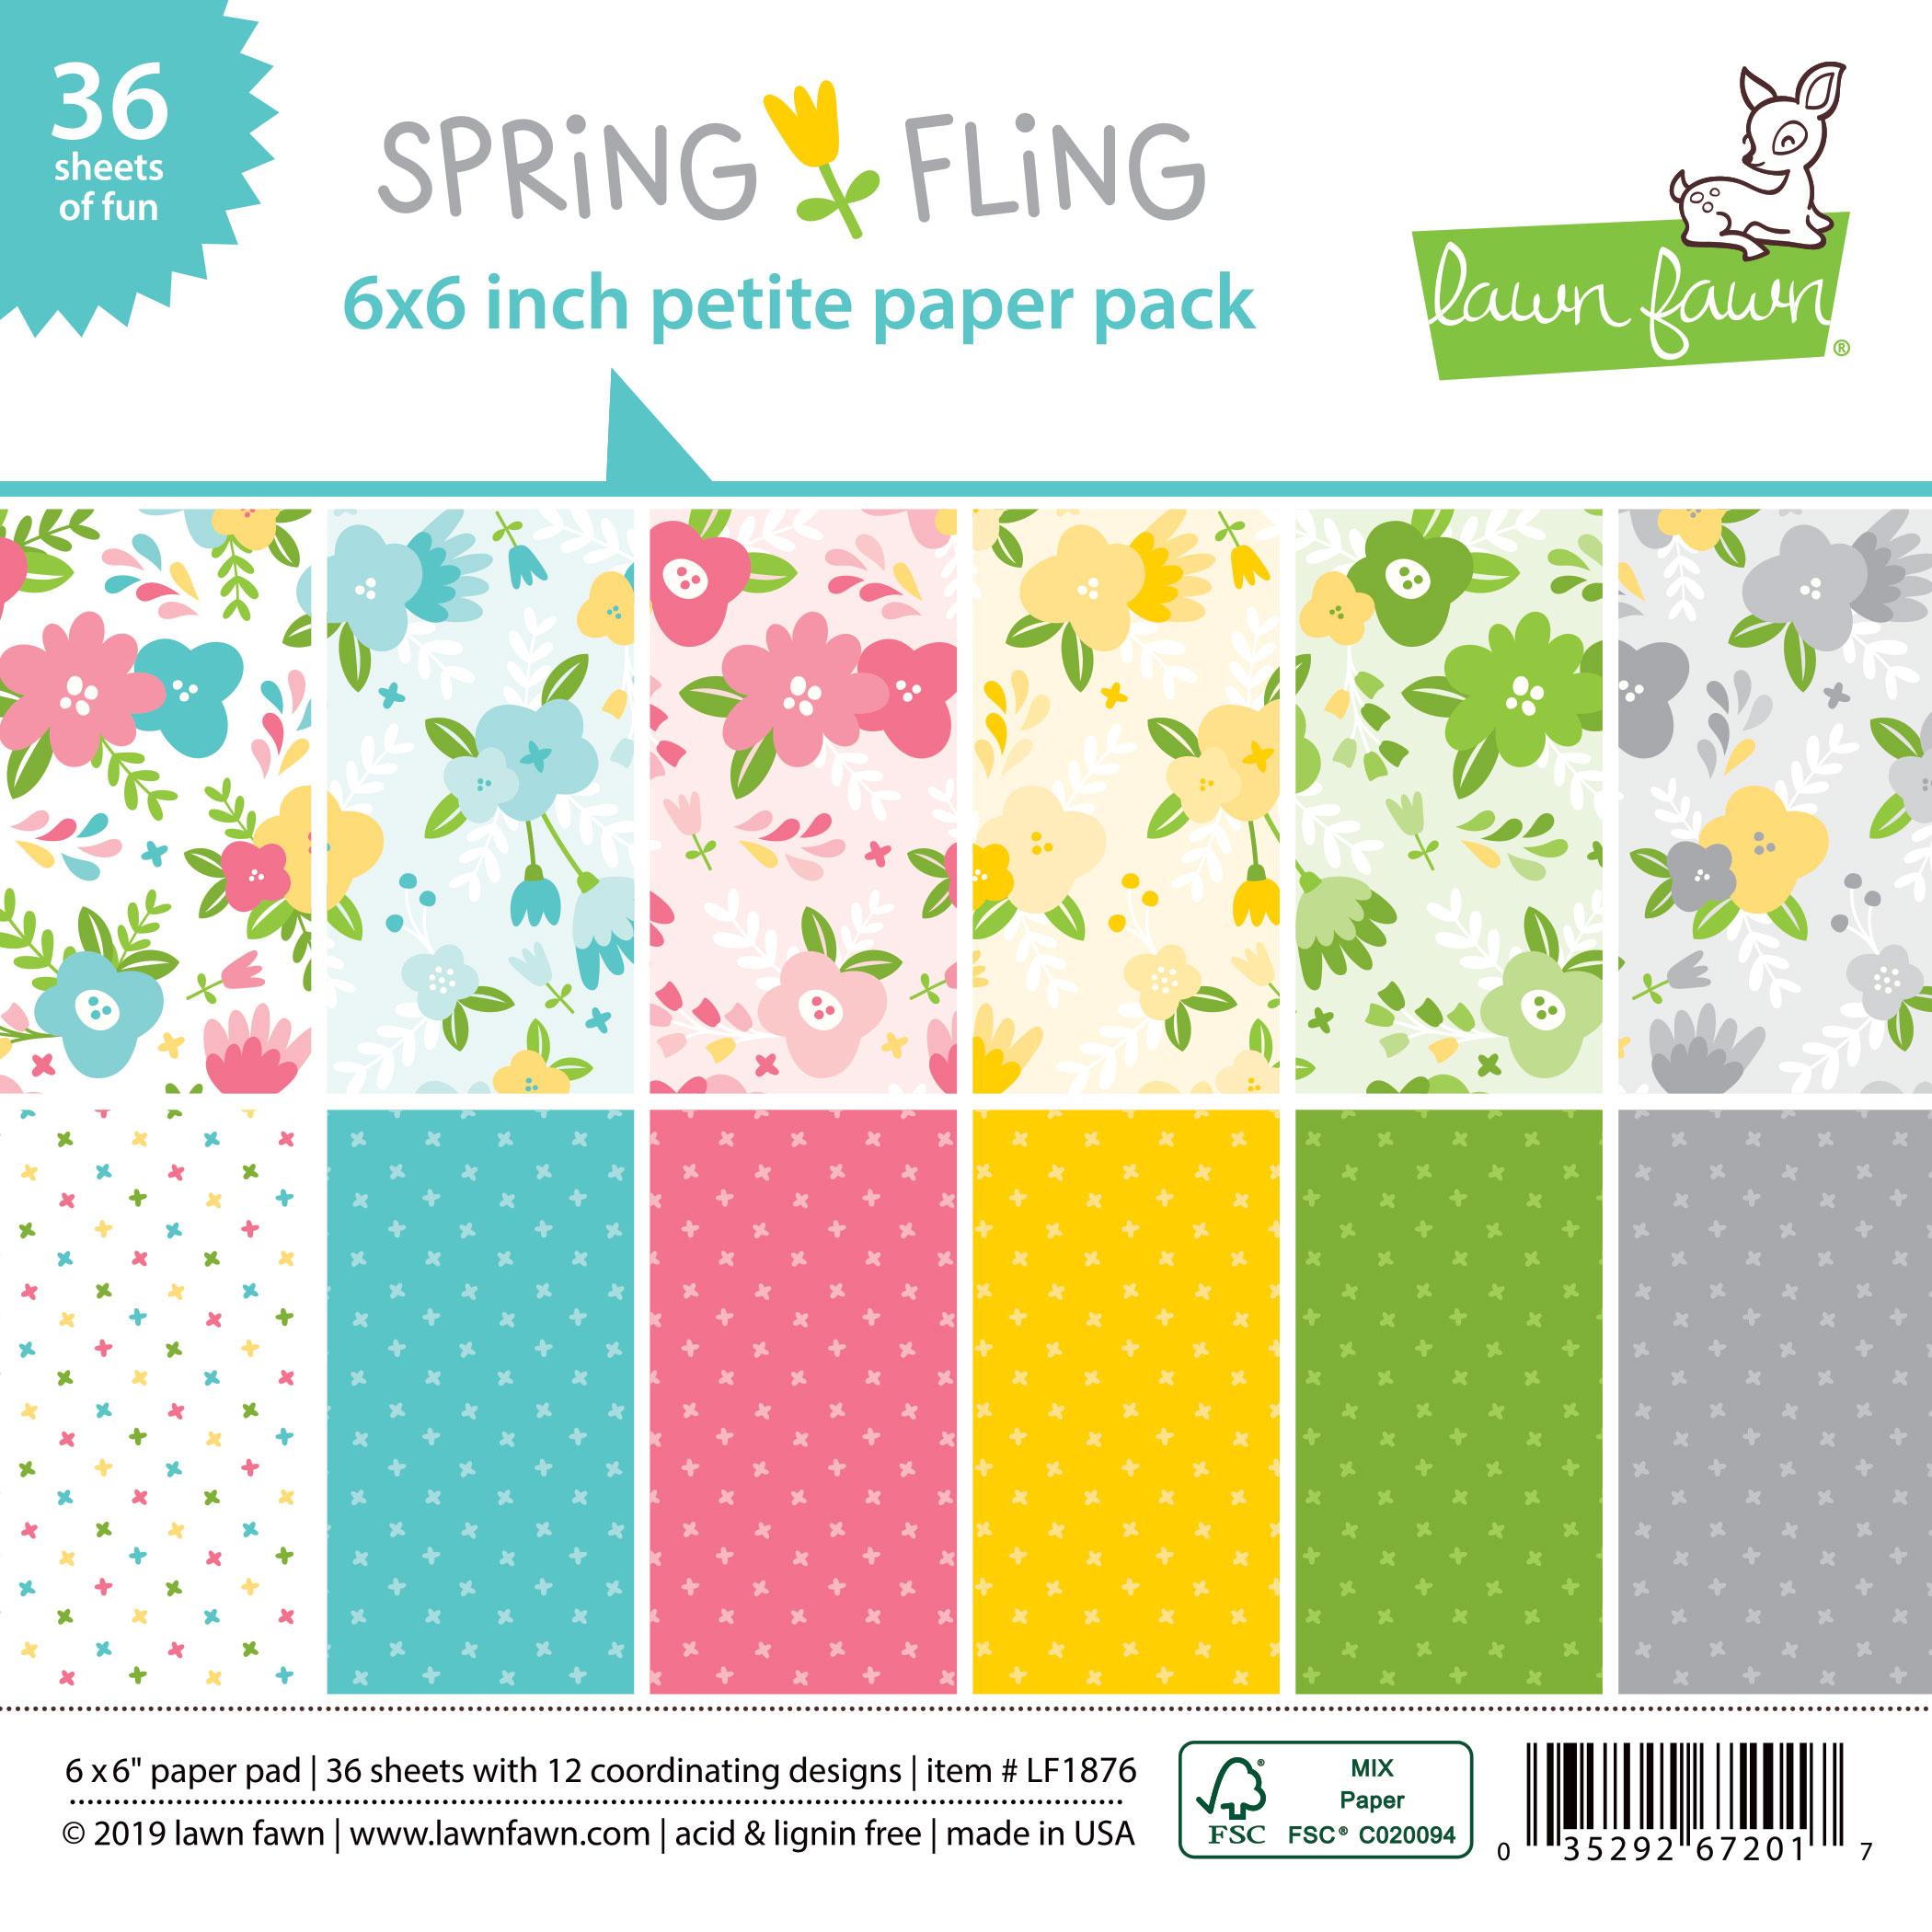 6X6 Petite Paper Pack, Spring Fling